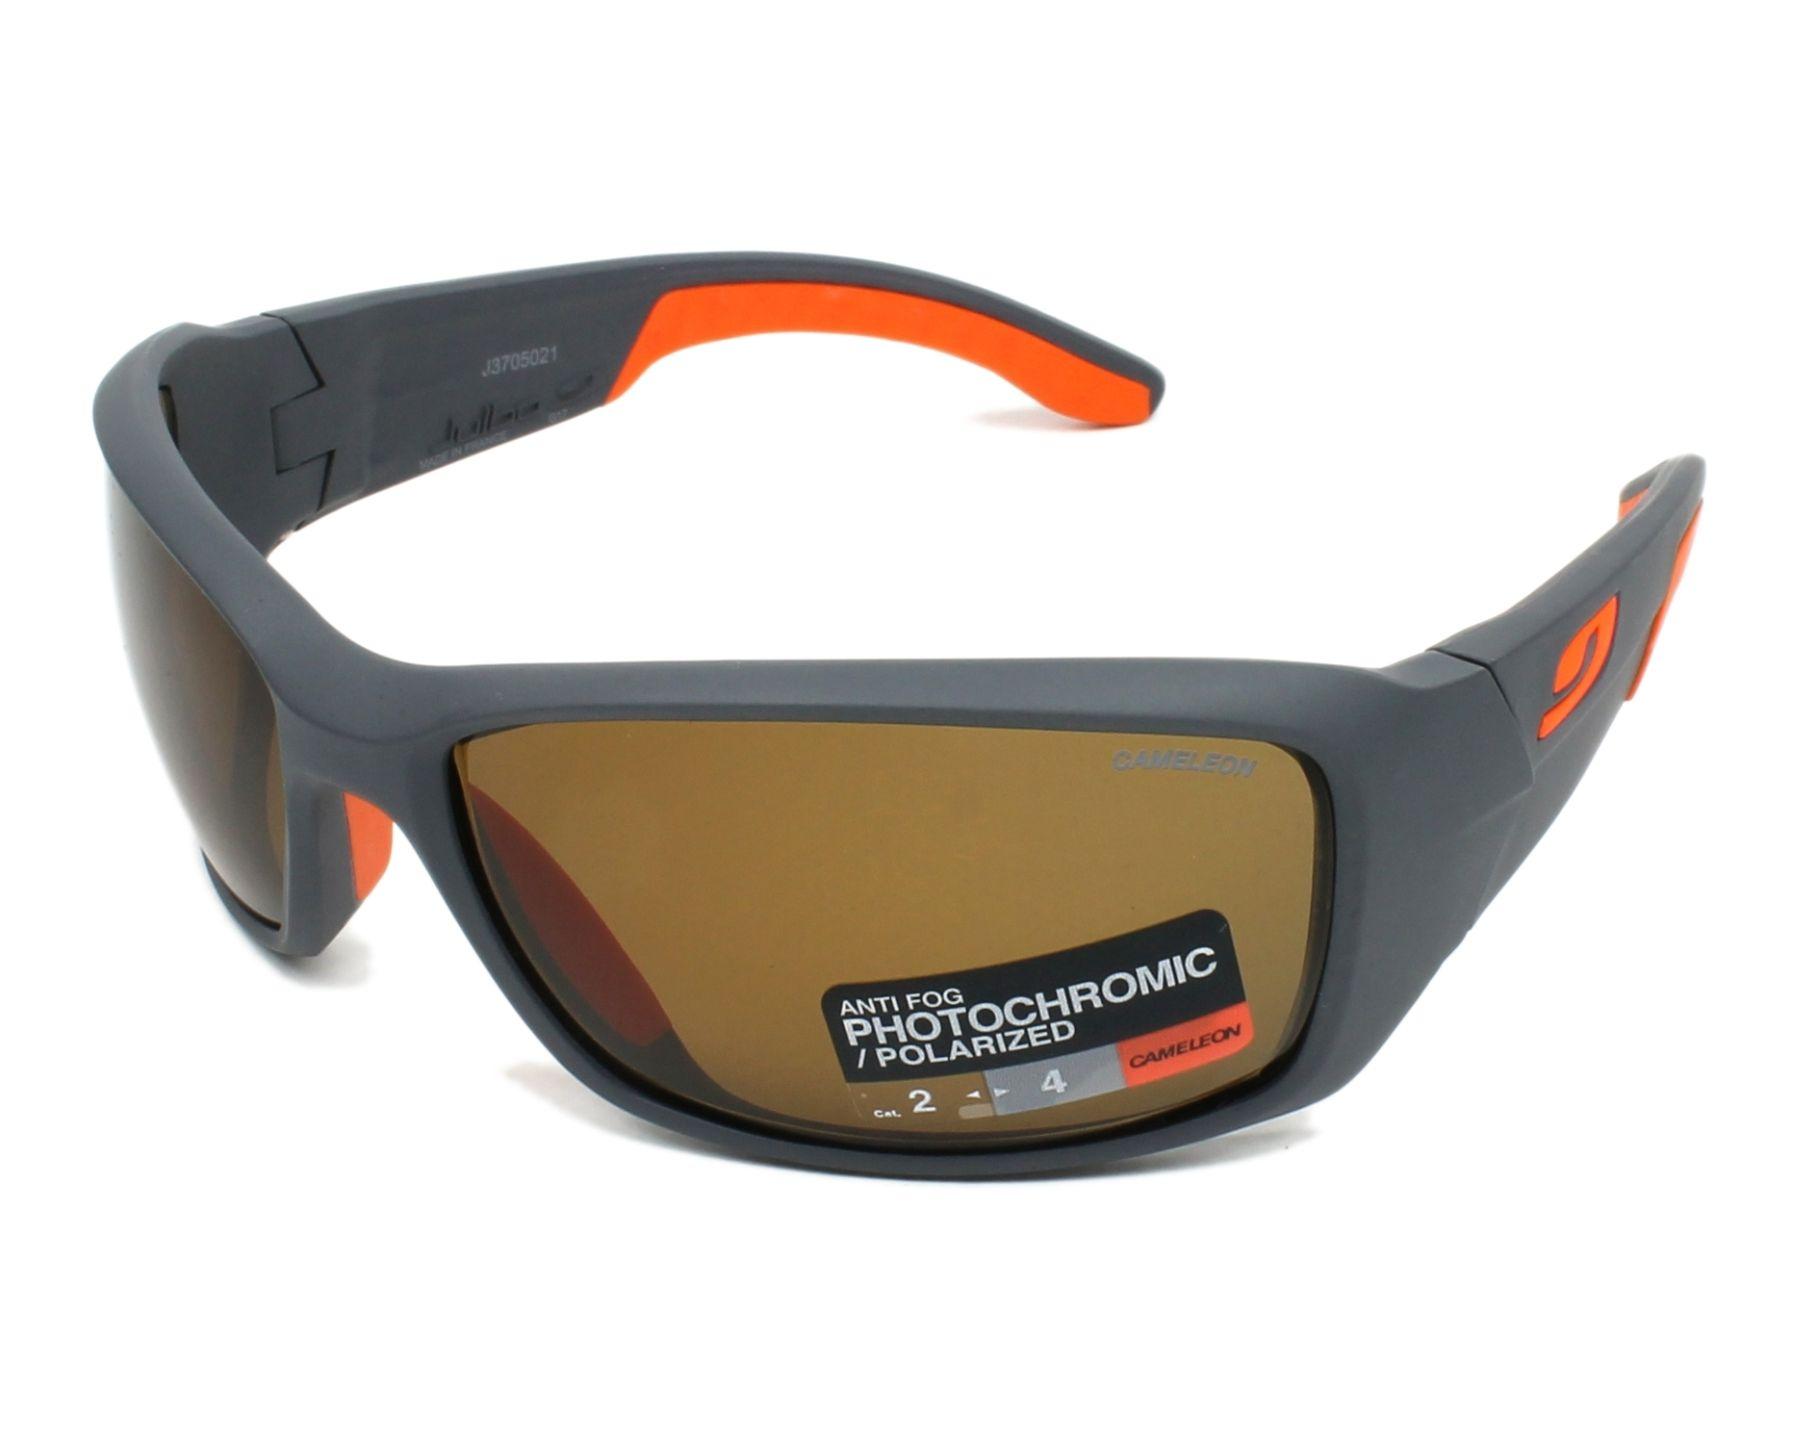 adff42437ae Sunglasses Julbo J370 5021 66-17 Grey Orange profile view